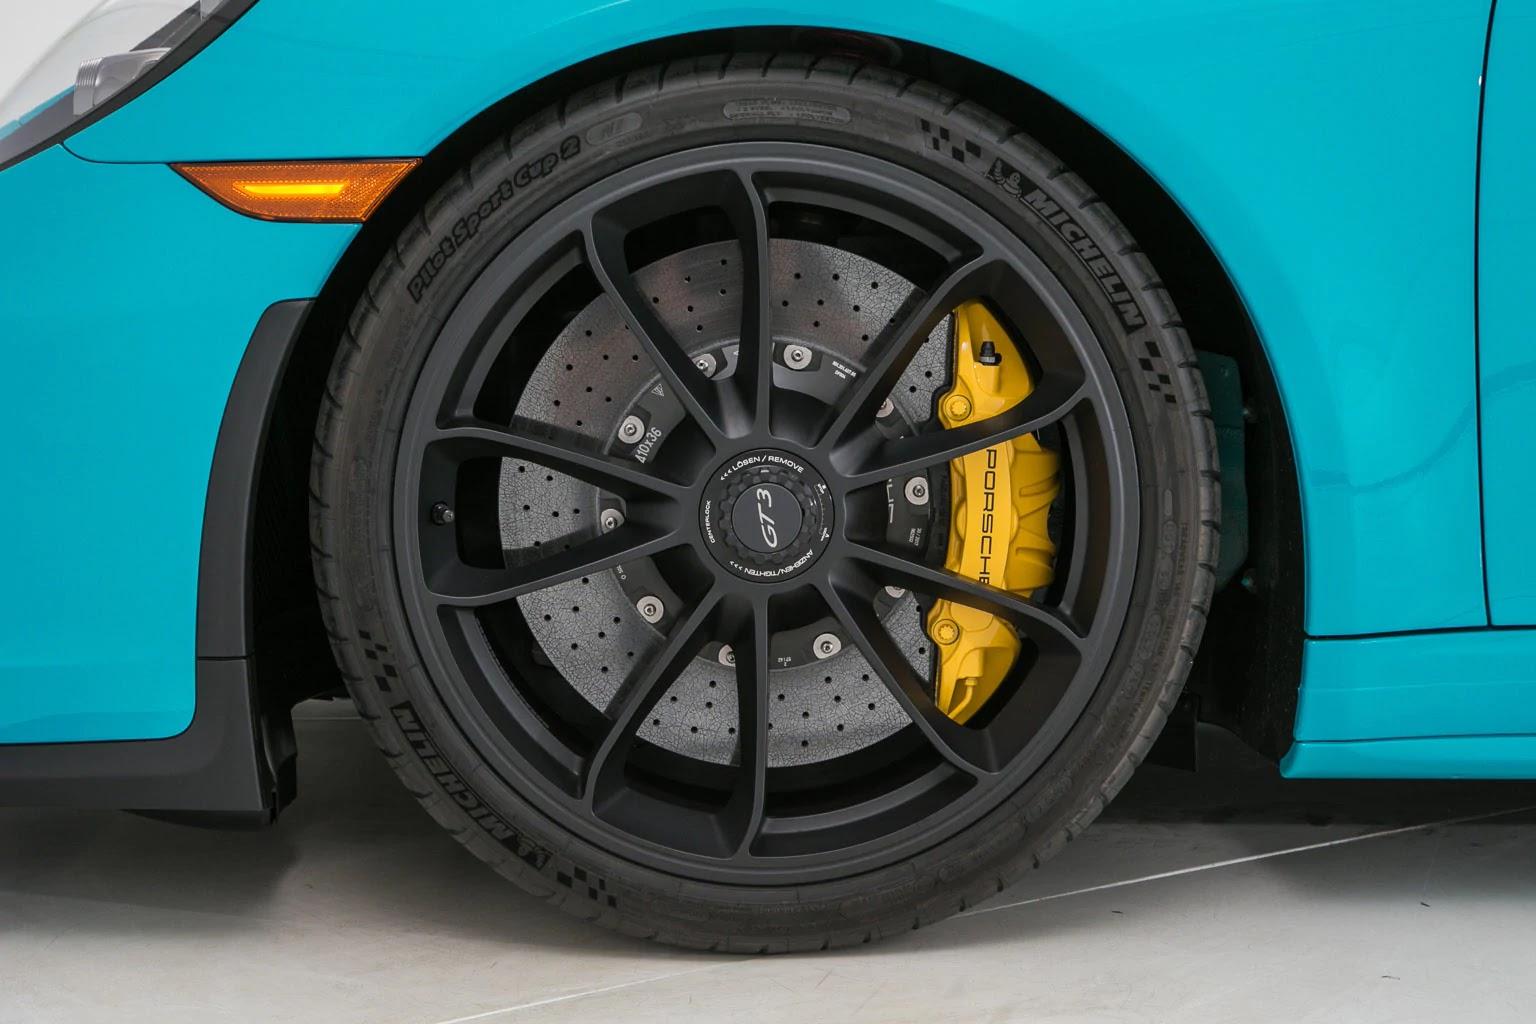 Porsche_911_GT3_Miami_Blue_01